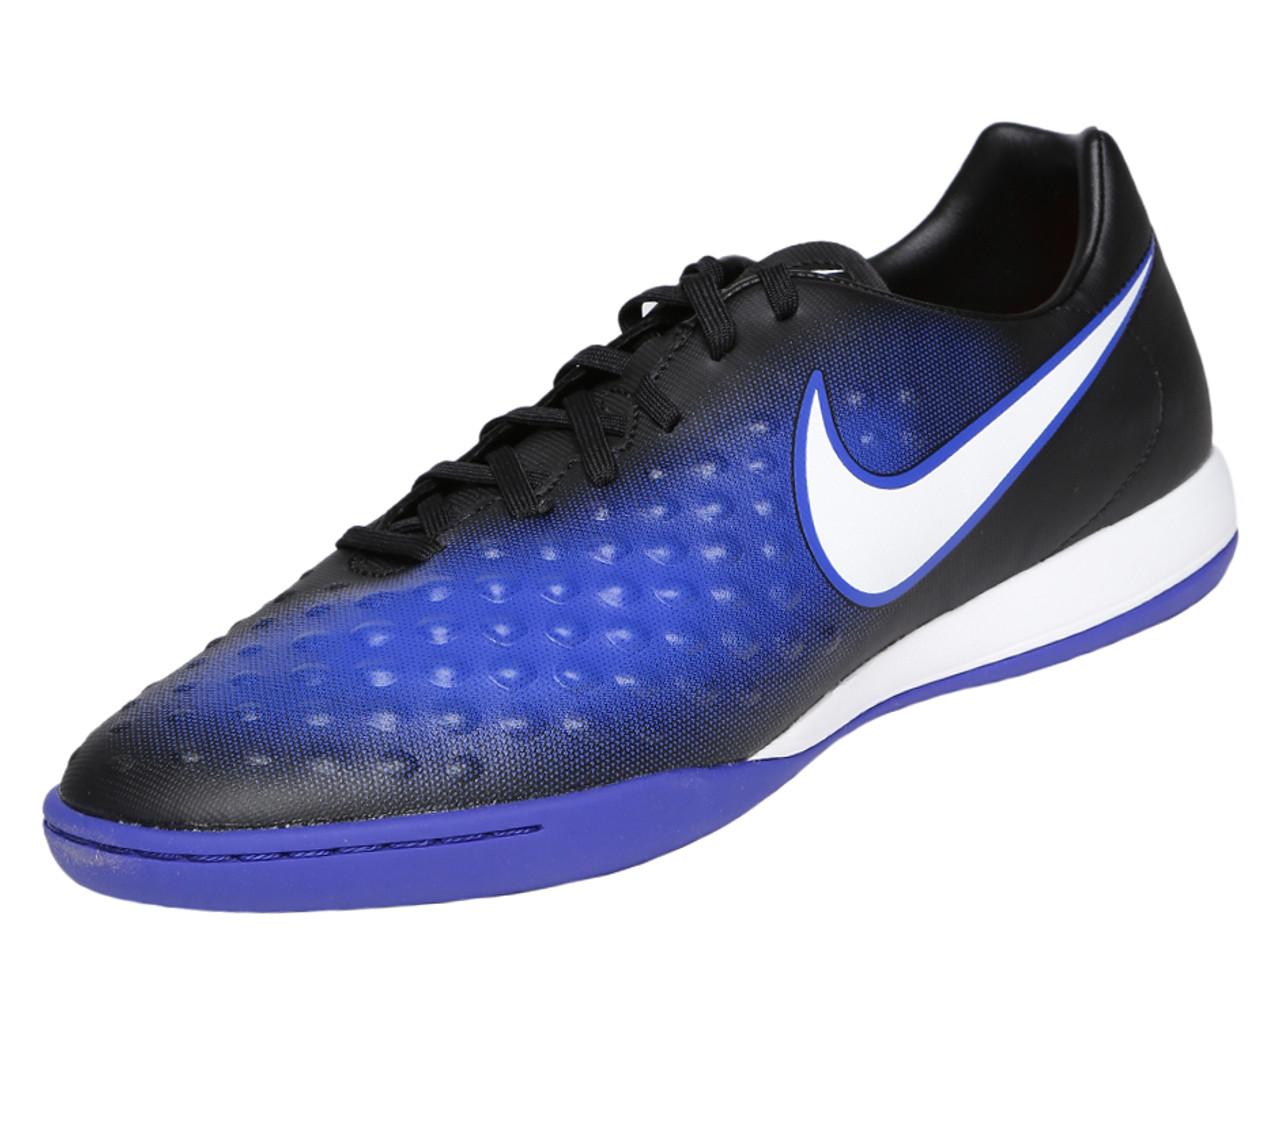 ddf306c0496 ... Nike MagistaX Onda II IC - Black White Paramount Blue (052519). Add to  Cart